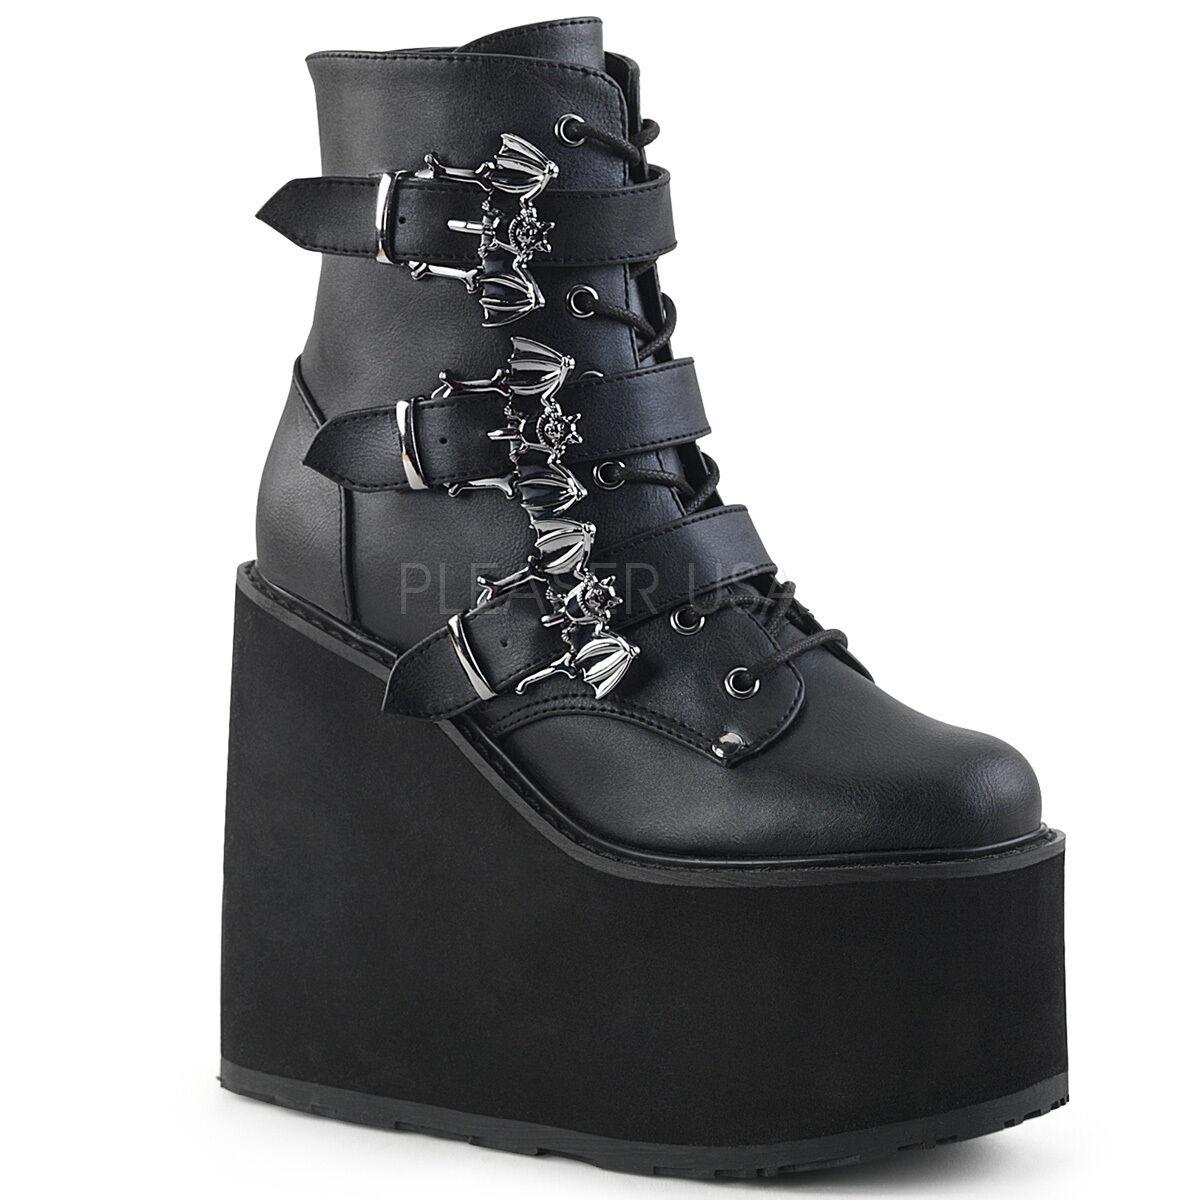 Demonia 5.5  Platform Vegan Wedge Stud Strap Skull Boots Goth Cyber Club 6-12